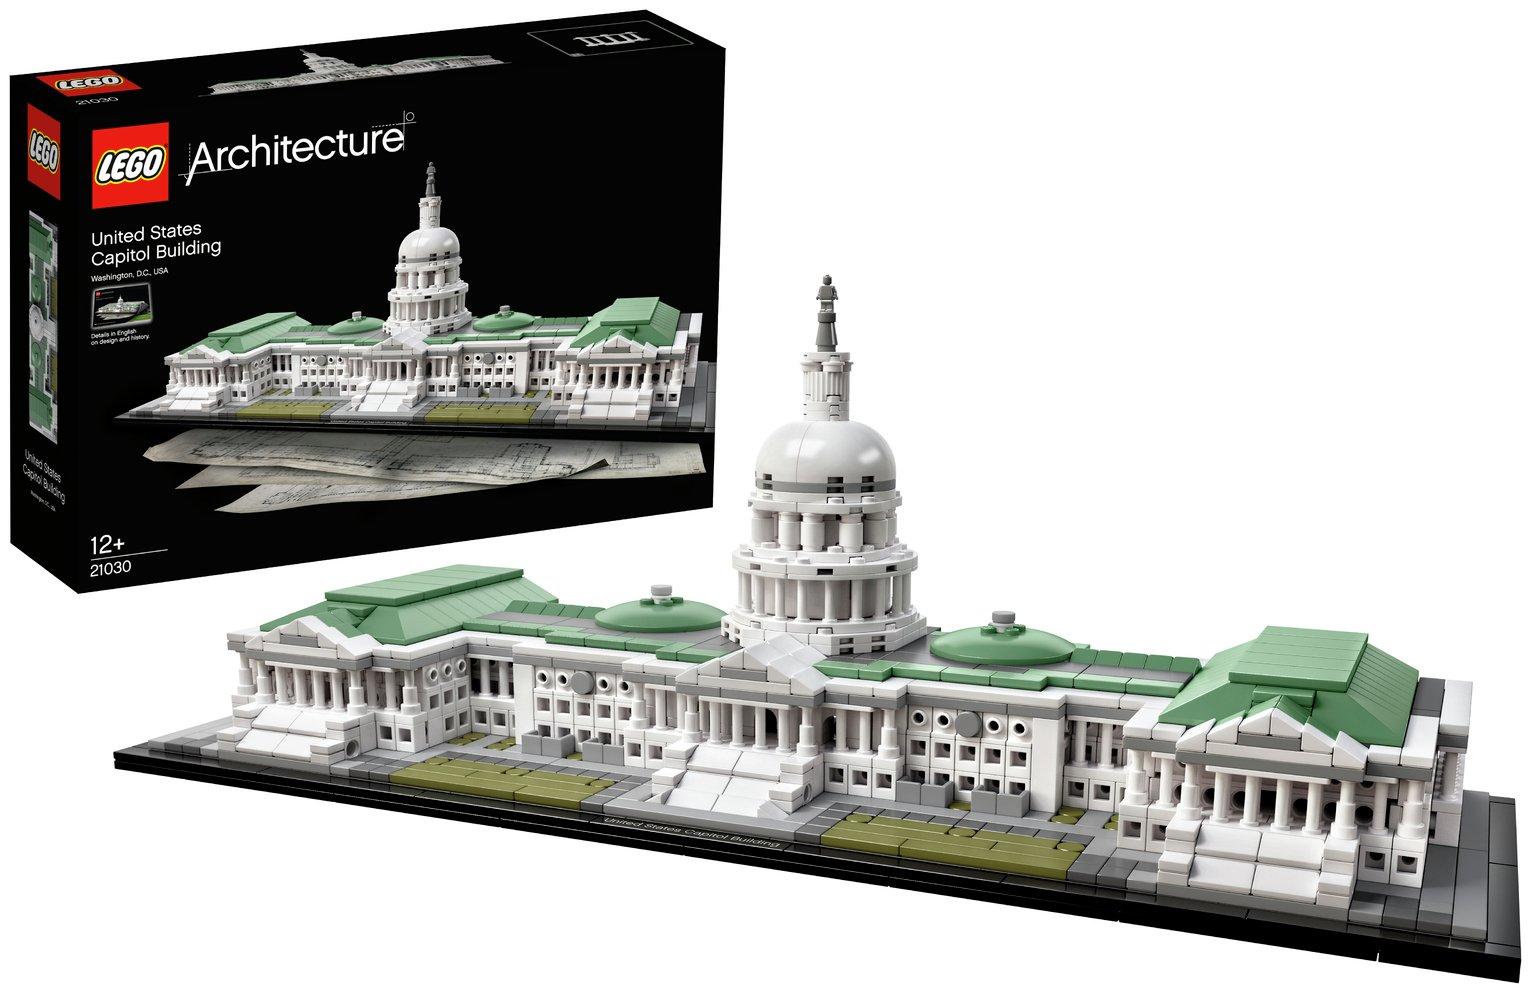 LEGO Architecture United States Capitol Building Set